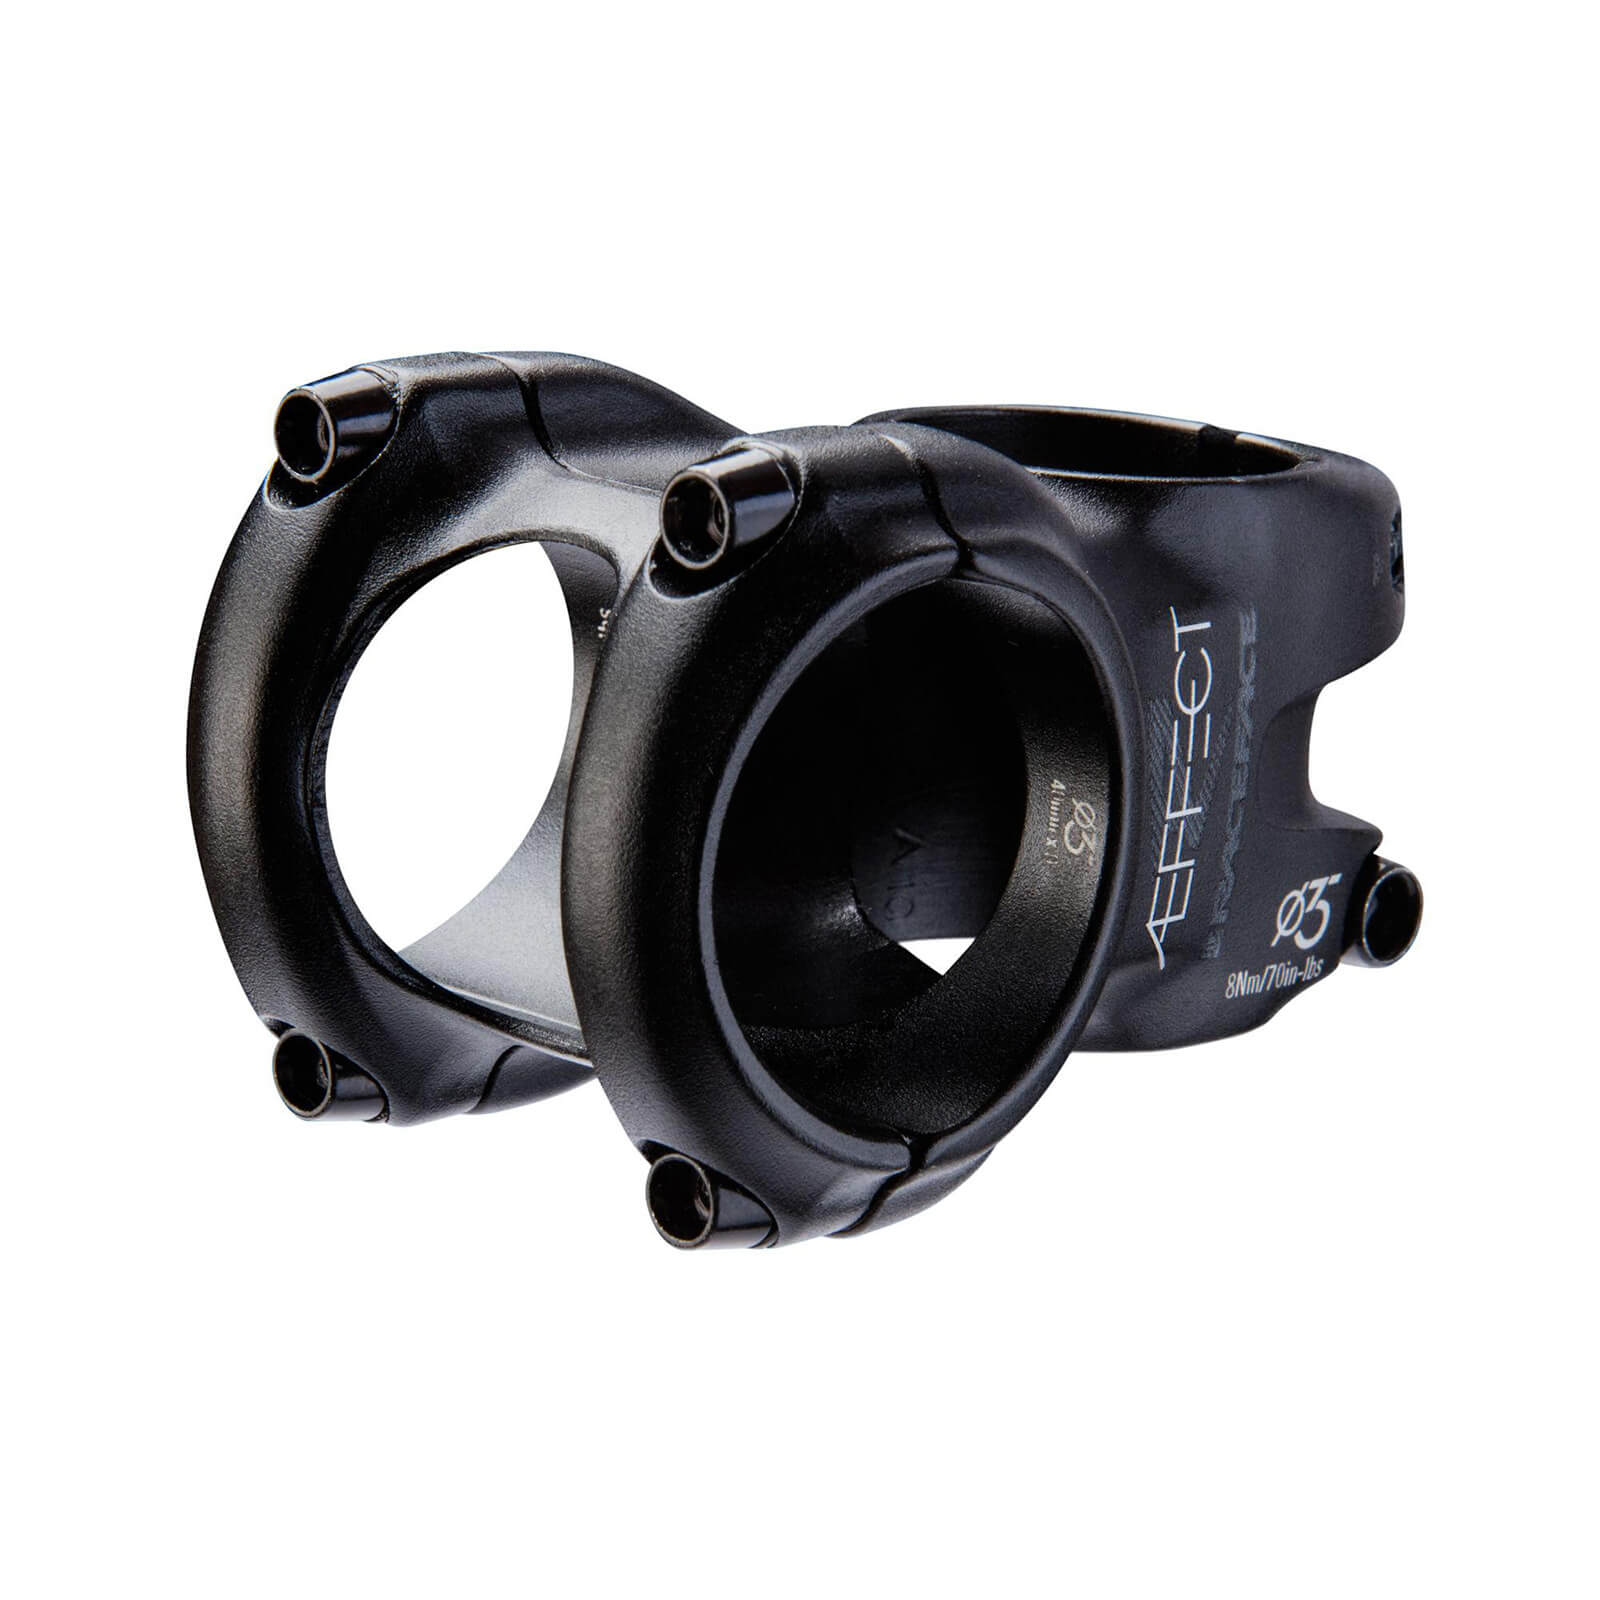 Race Face Aeffect R 35mm MTB Alloy Stem - 40mm